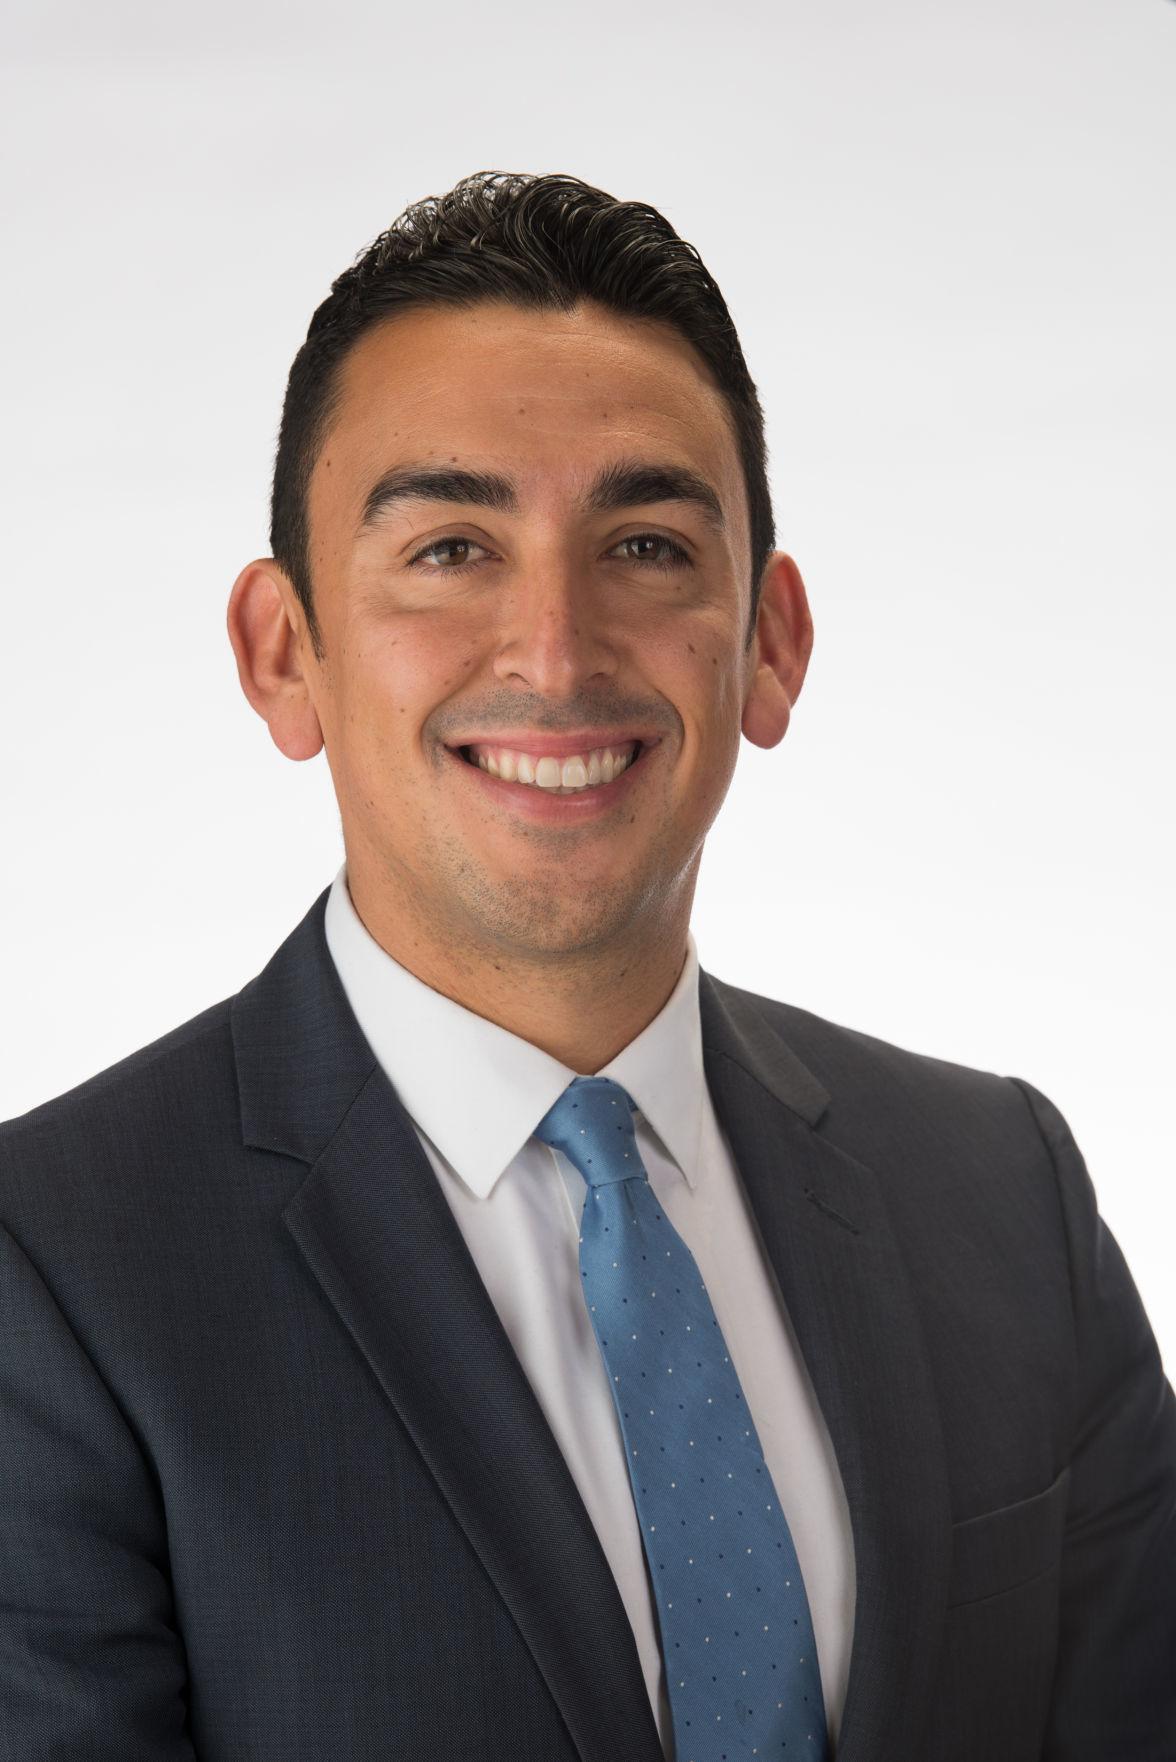 Alfredo Peroza supervisors race